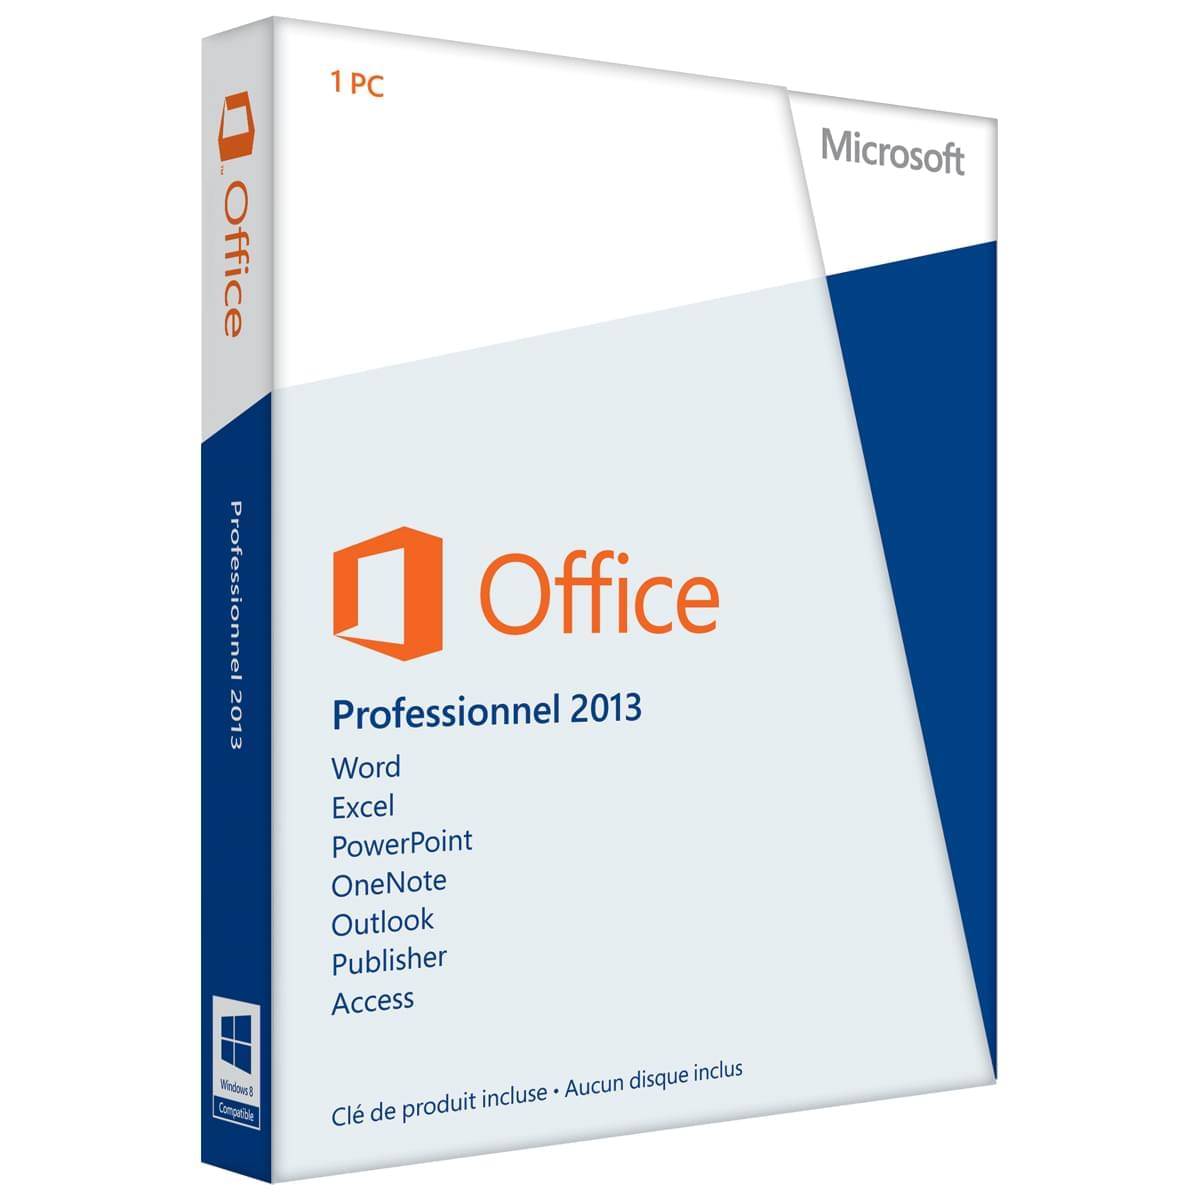 Microsoft Office PRO 2013 OEM Cybertek - Logiciel suite bureautique - 0